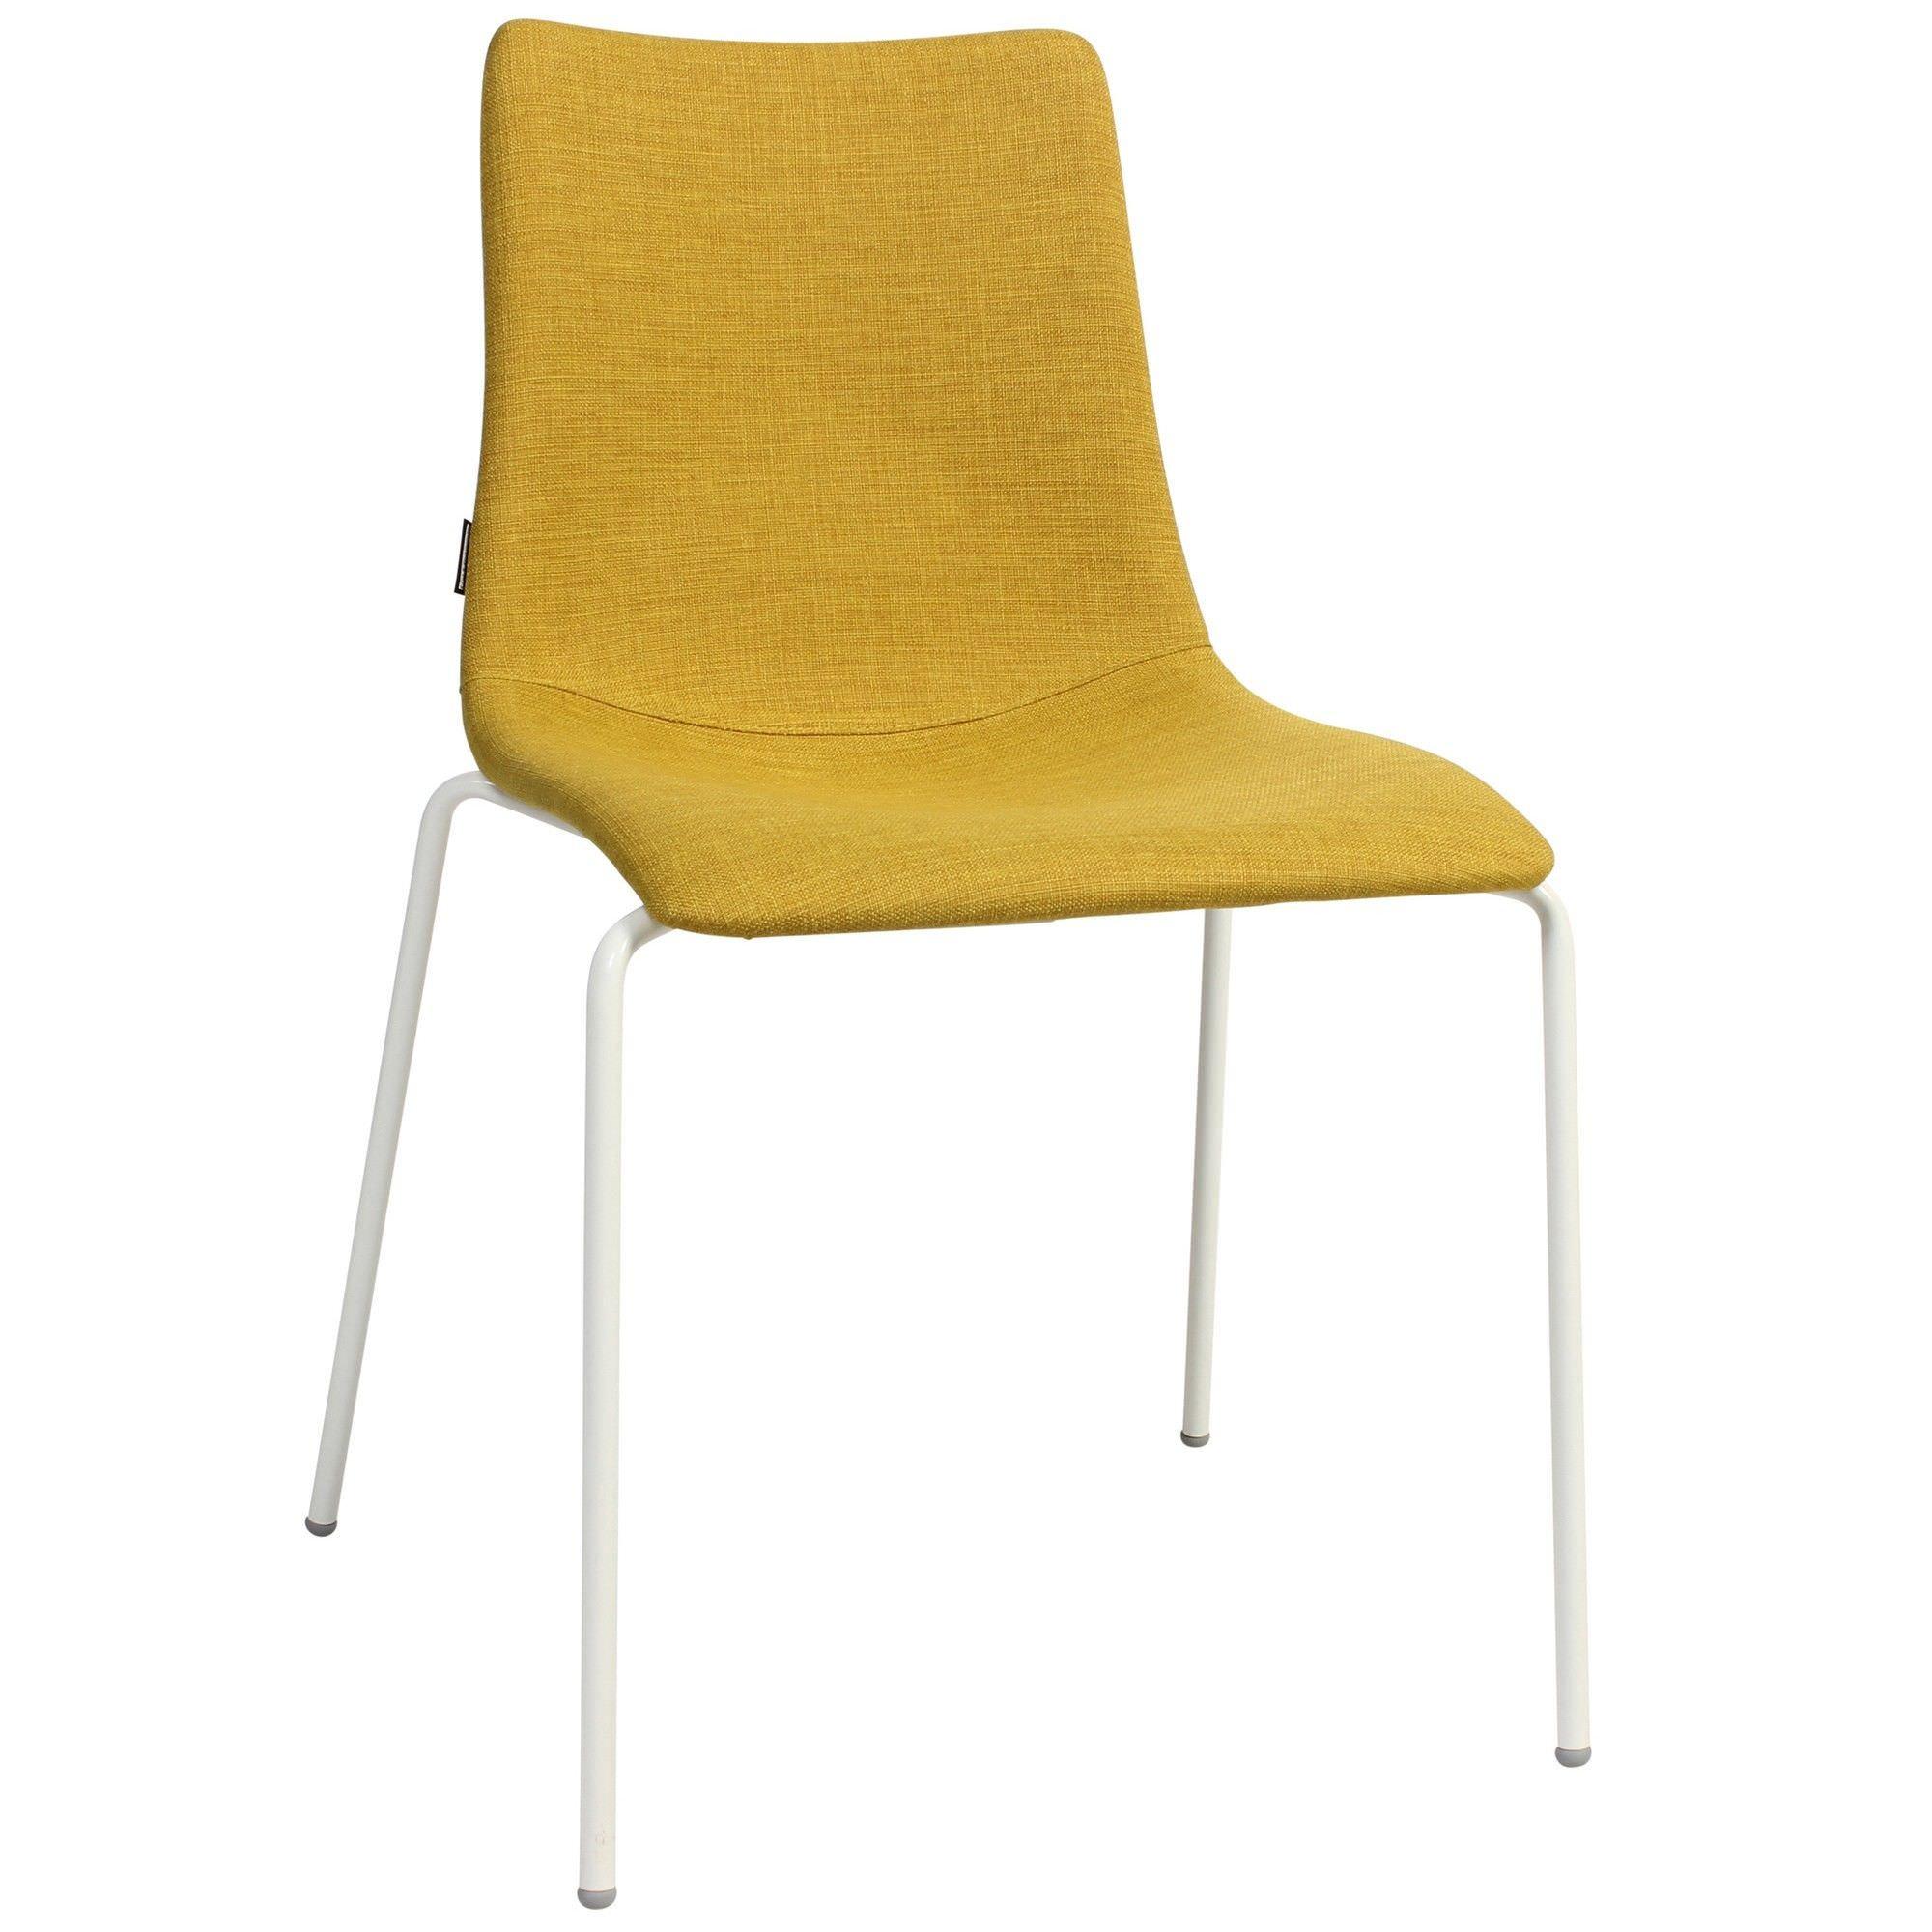 Zebra Pop Italian Made Commercial Grade Fabric Dining Chair, Metal Leg, Saffron / White